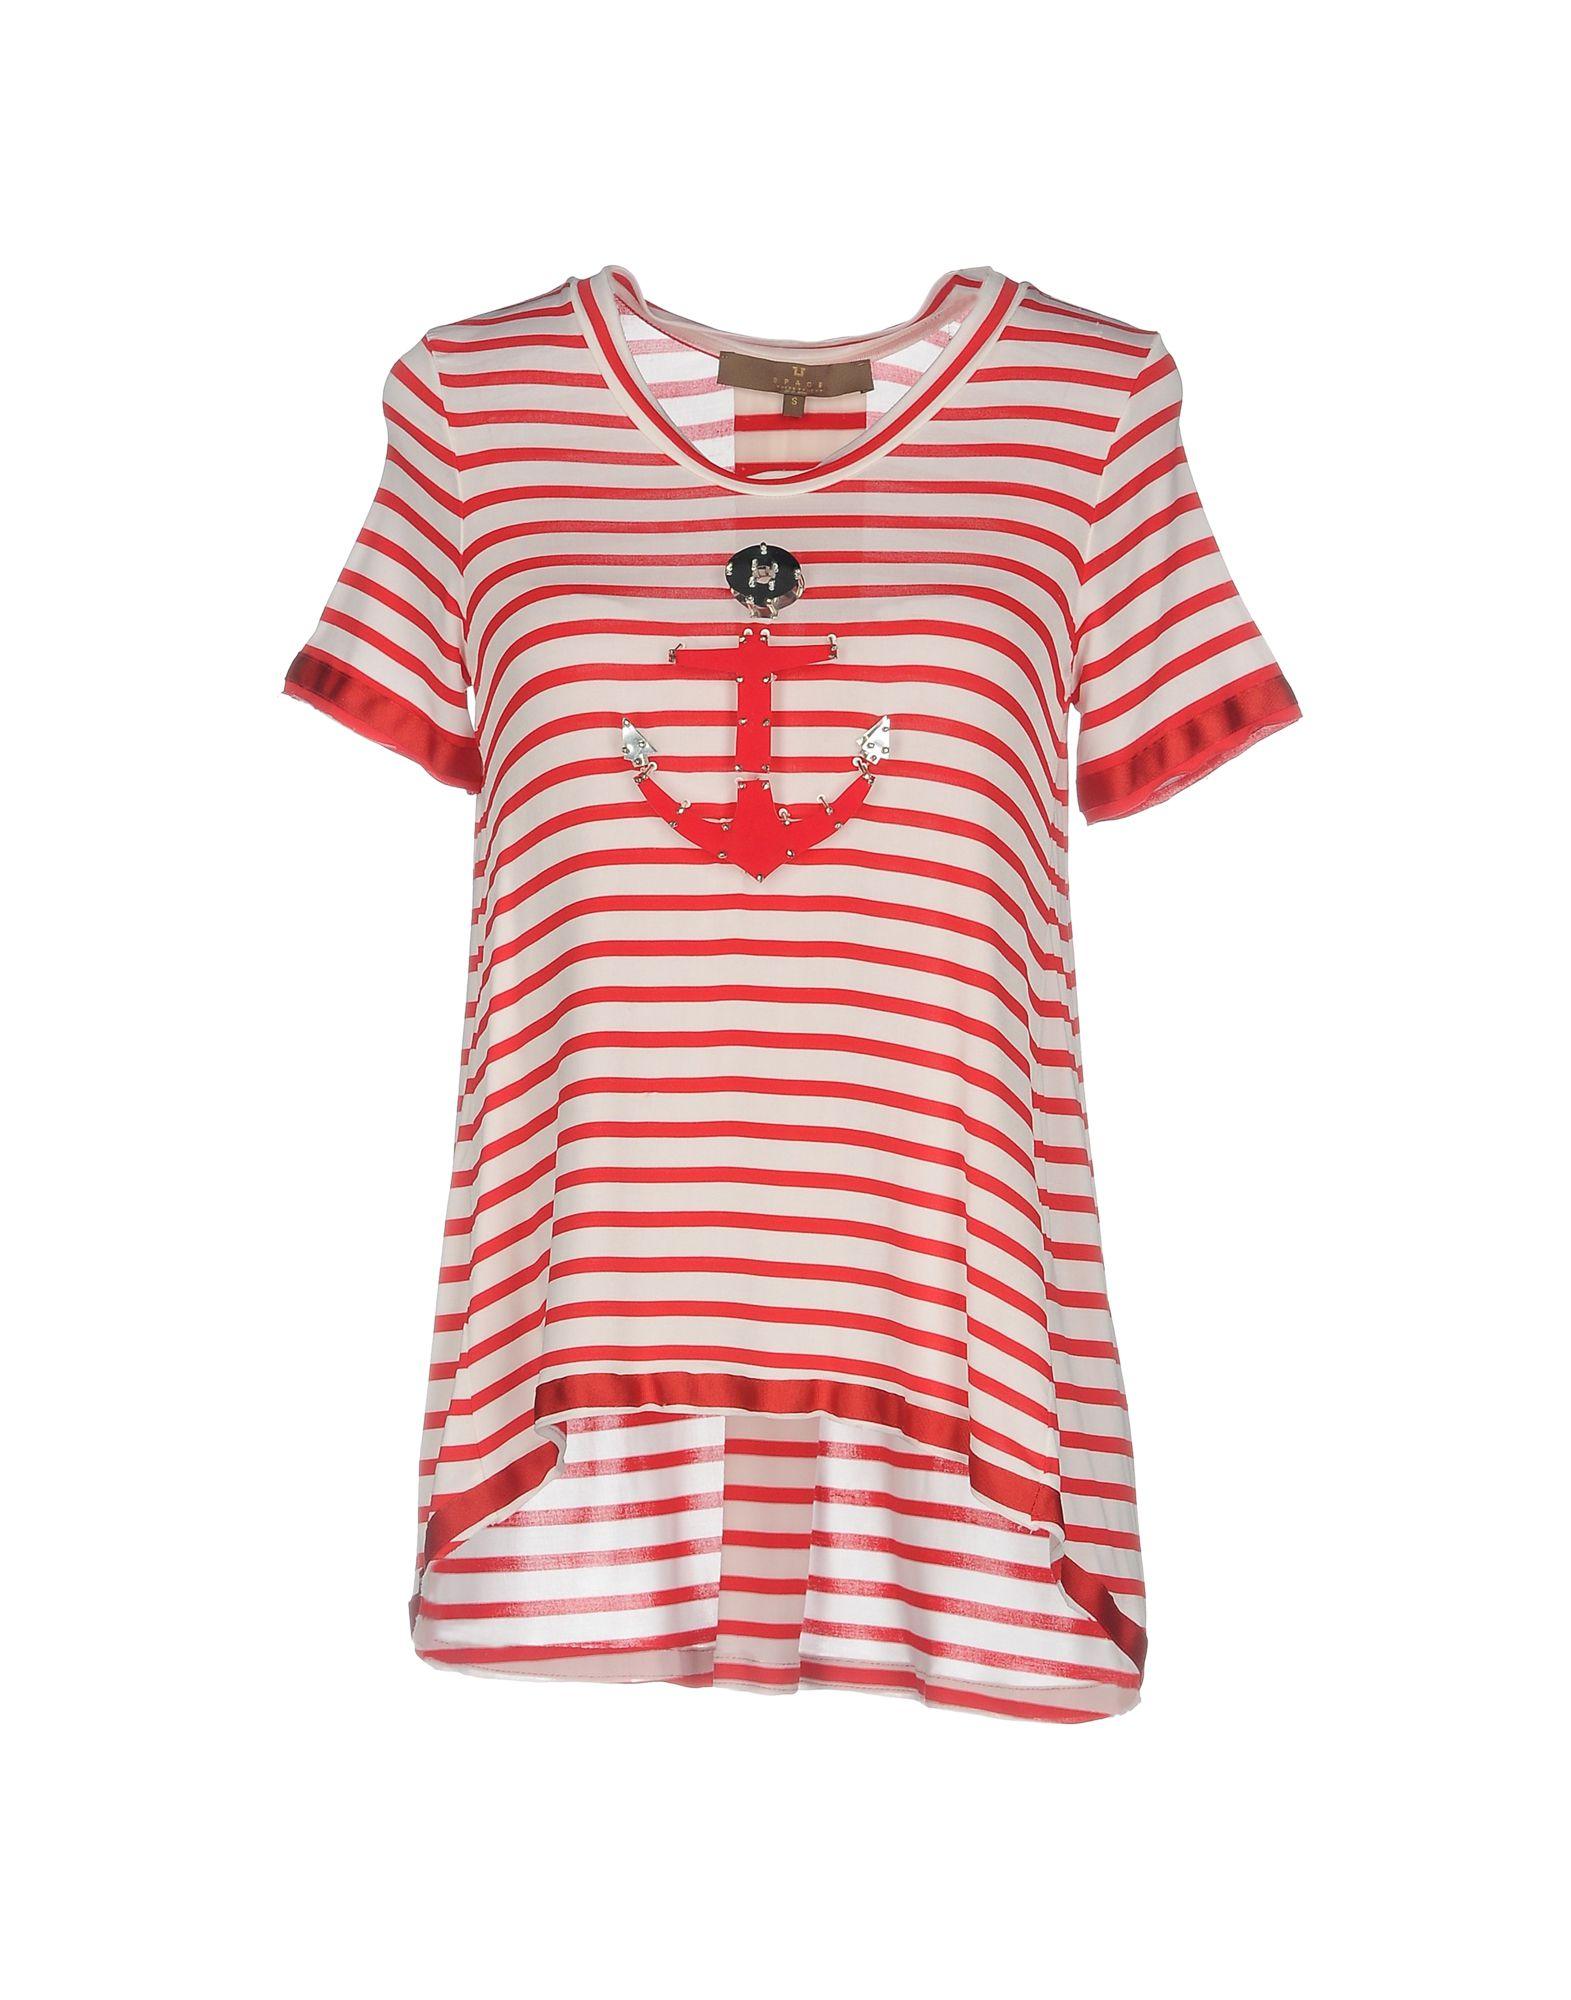 T-Shirt Space Style Concept Donna - Acquista online su